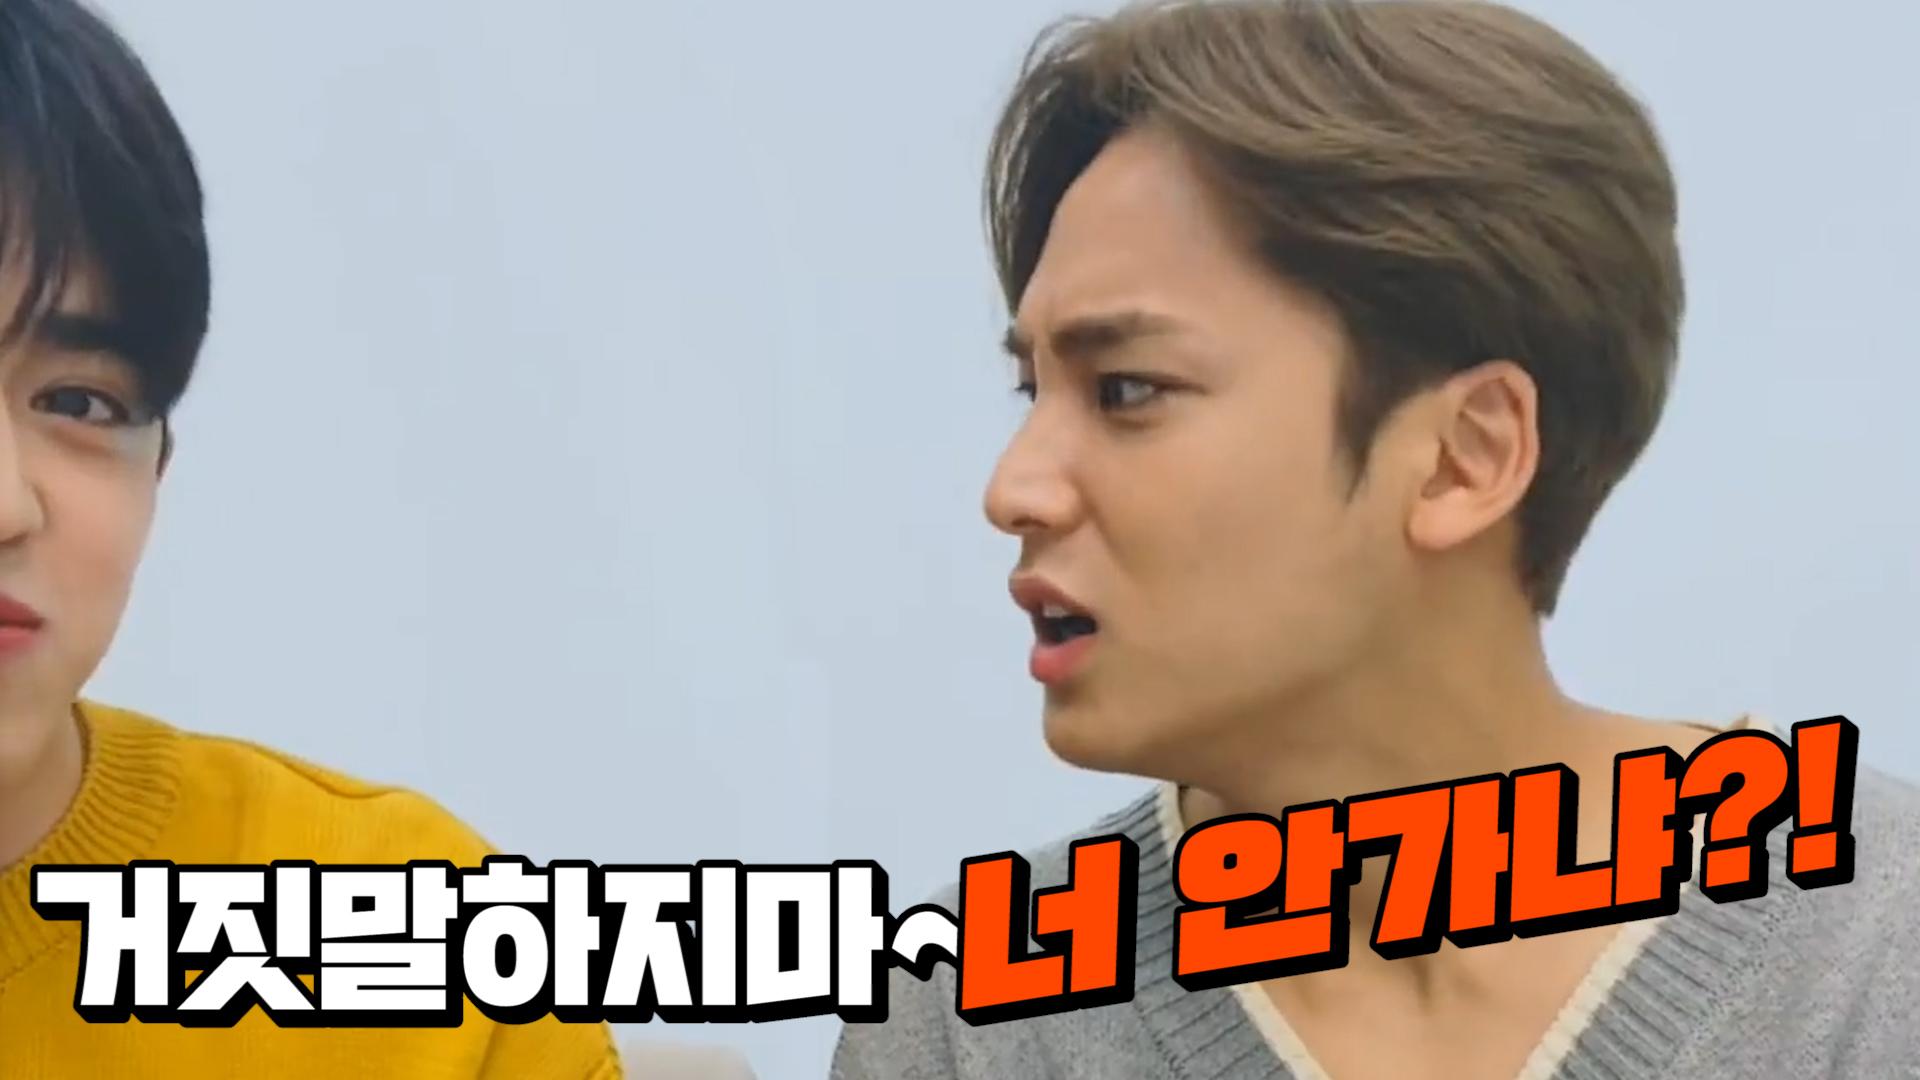 [SEVENTEEN] 유치깜찍뽕짝의 응답하라 0526 민규네➰😆 (MINGYU&SCOUPS fighting childishly)